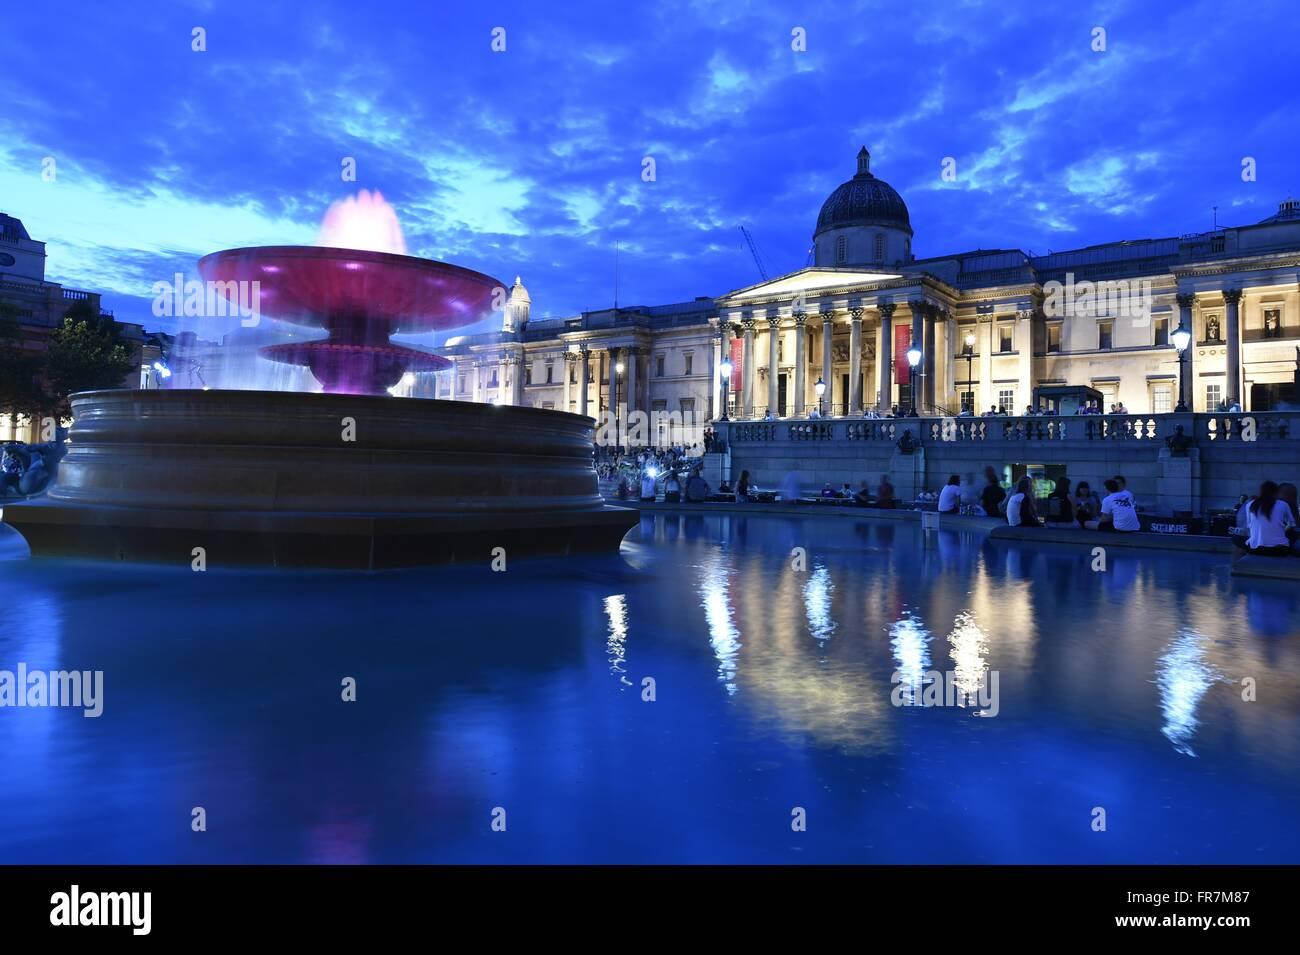 Trafalgar square, National Gallery, night, water, fountains, Tourist, London, UK, - Stock Image